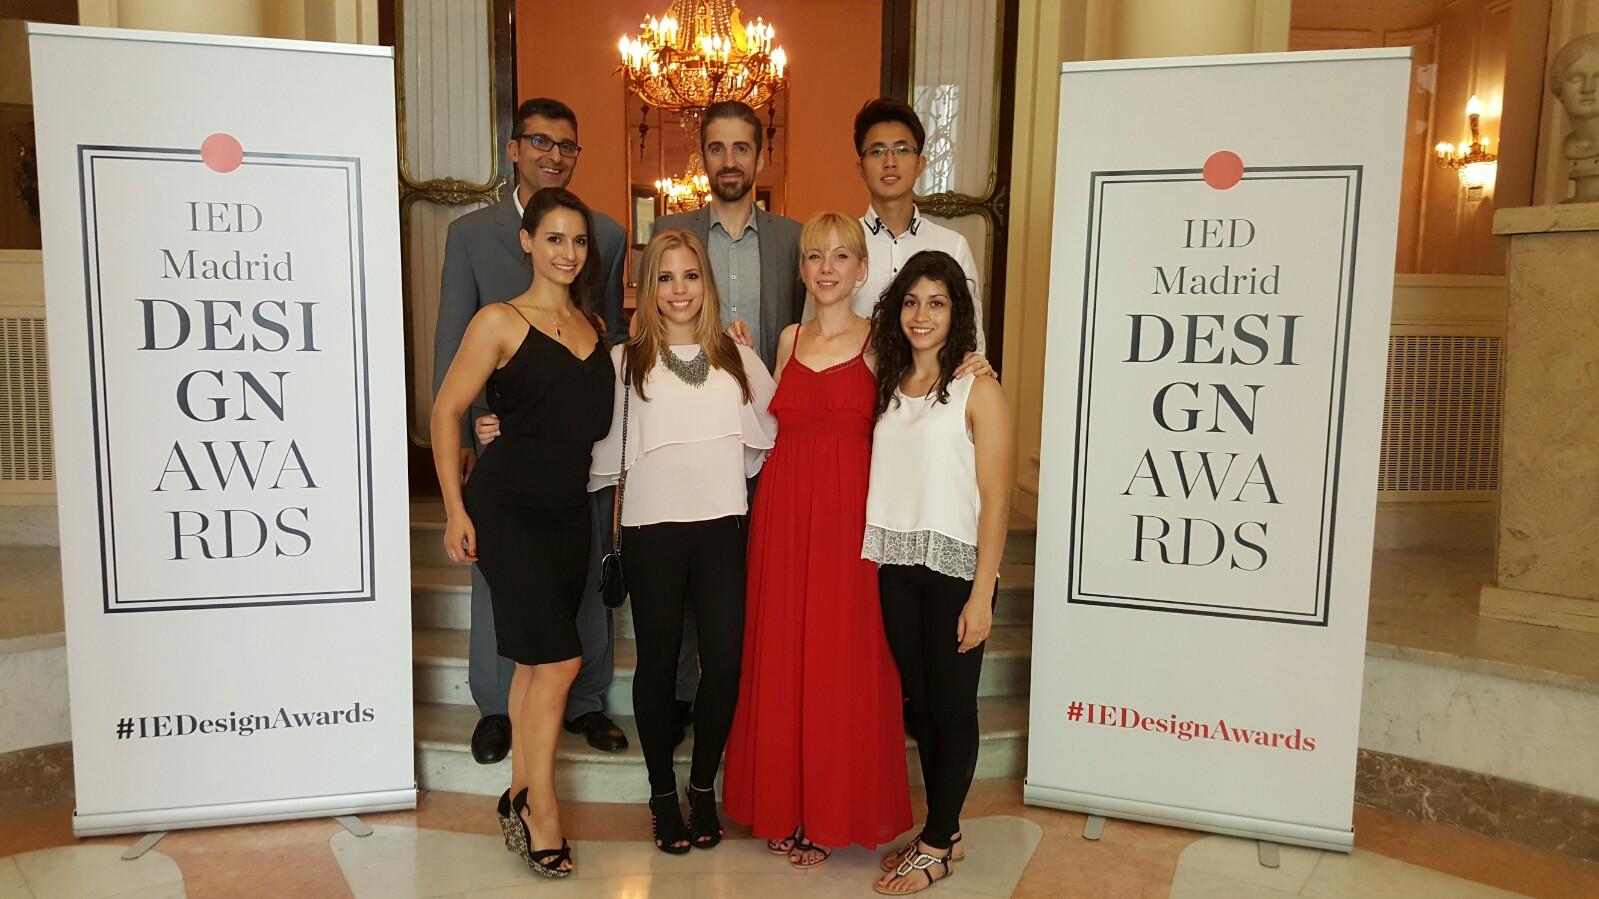 IED Design Awards